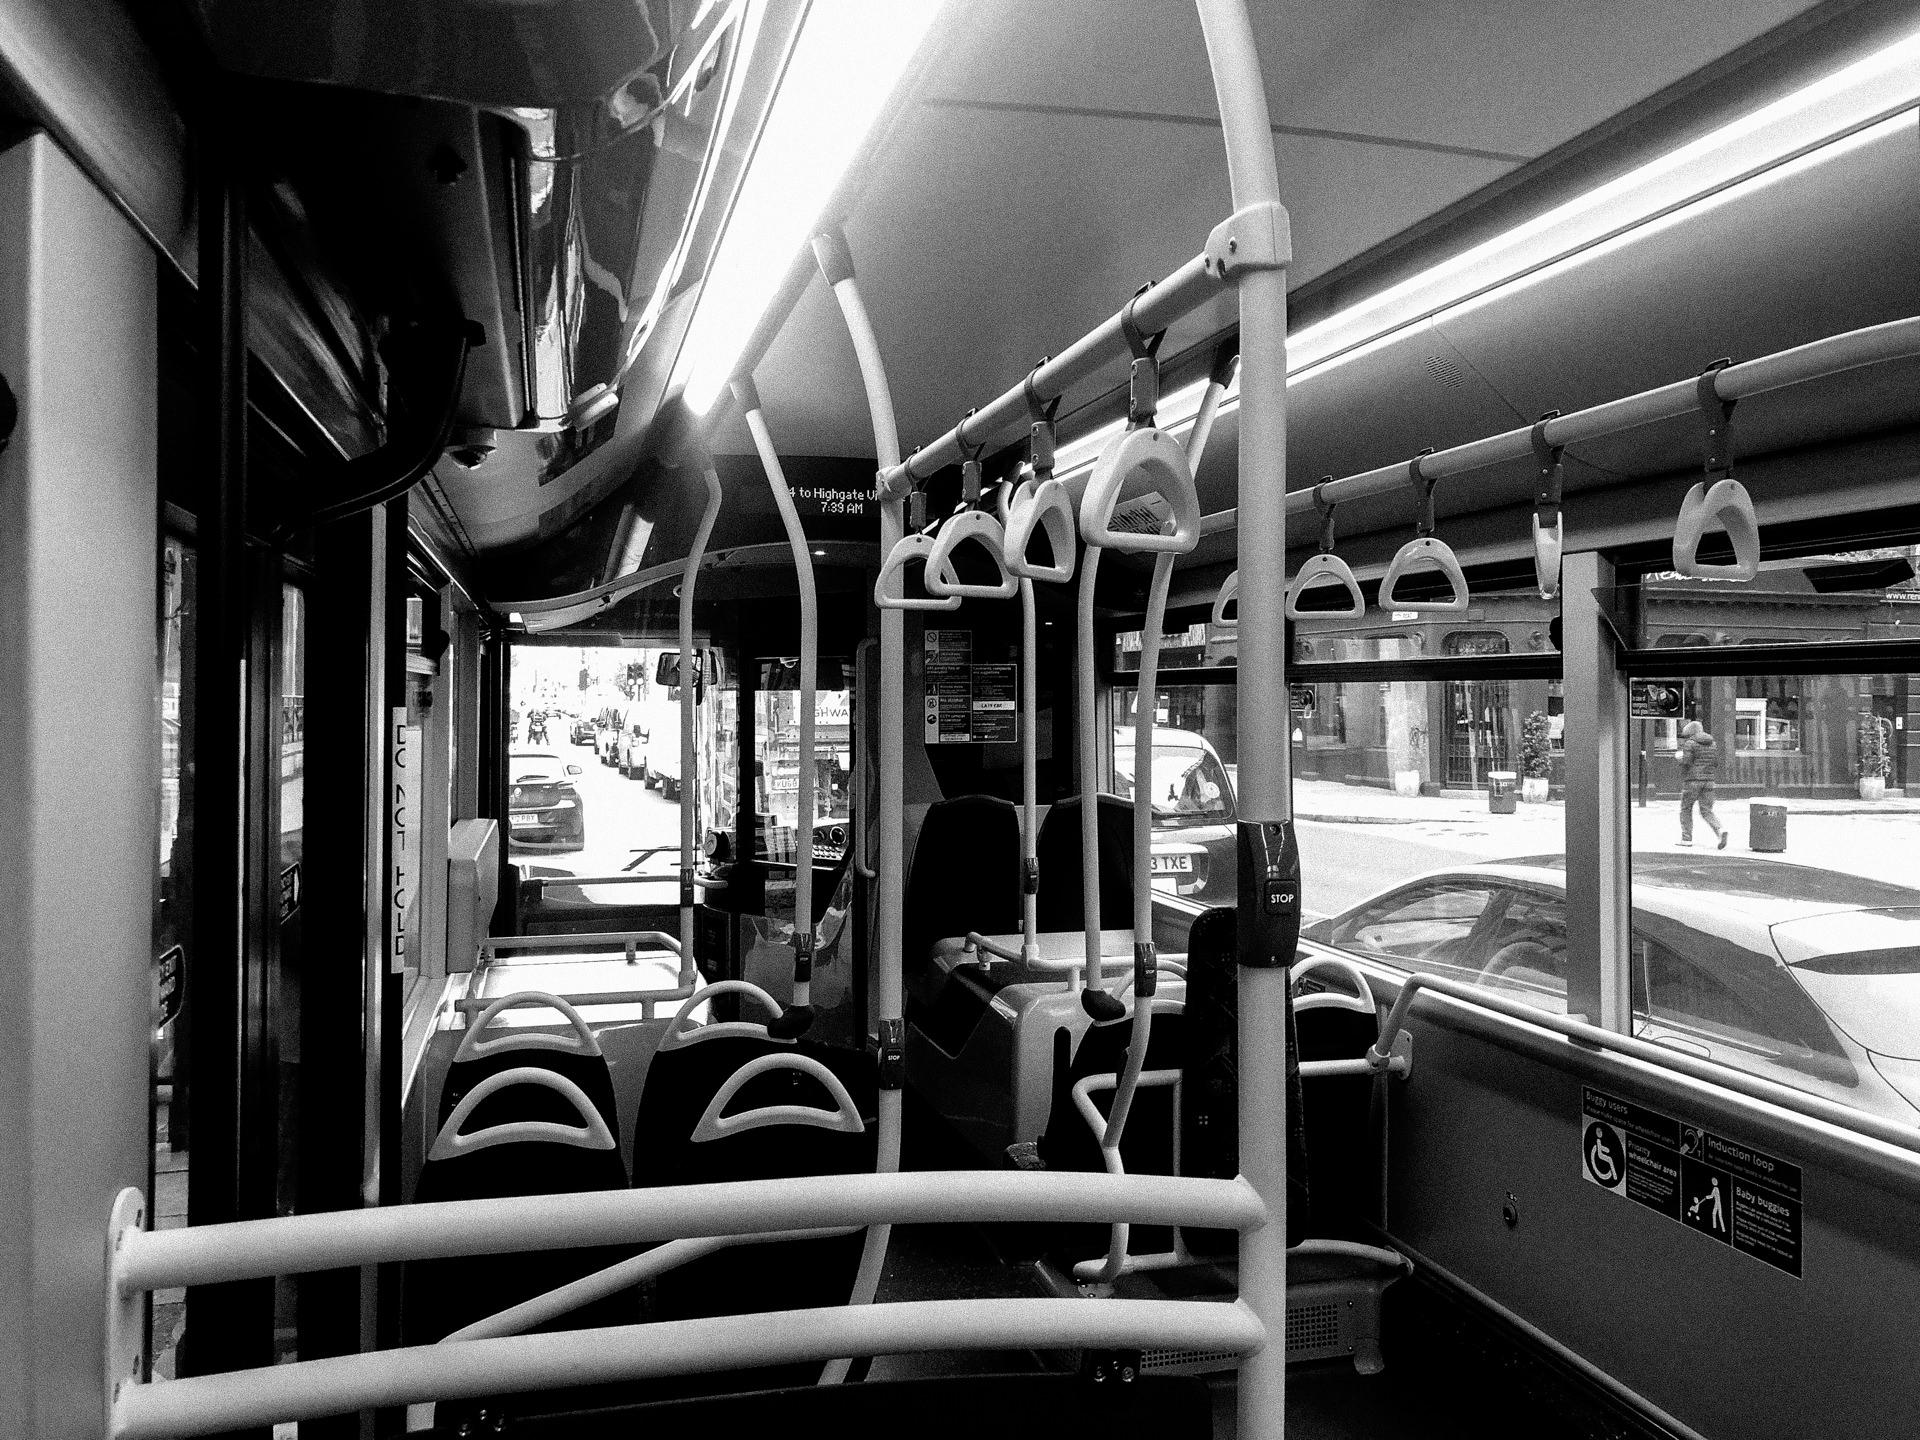 empty london bus due to the corona virus